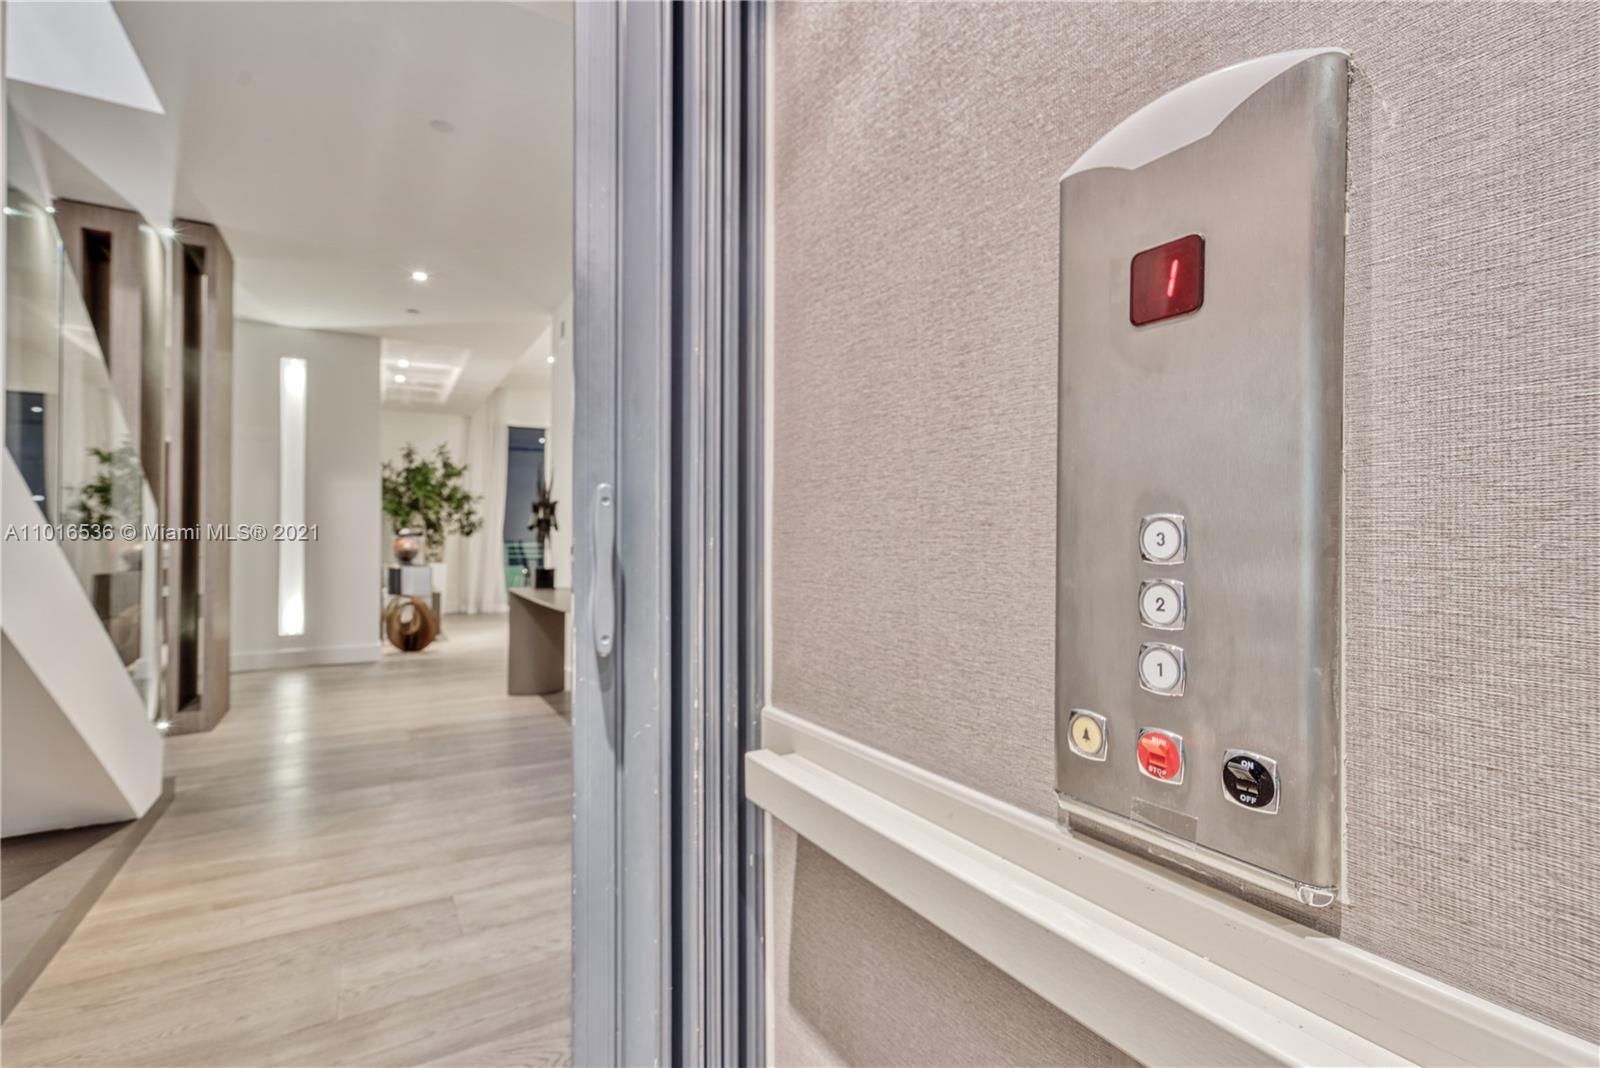 900 Brickell key blvd-PH4 miami-fl-33131-a11016536-Pic01